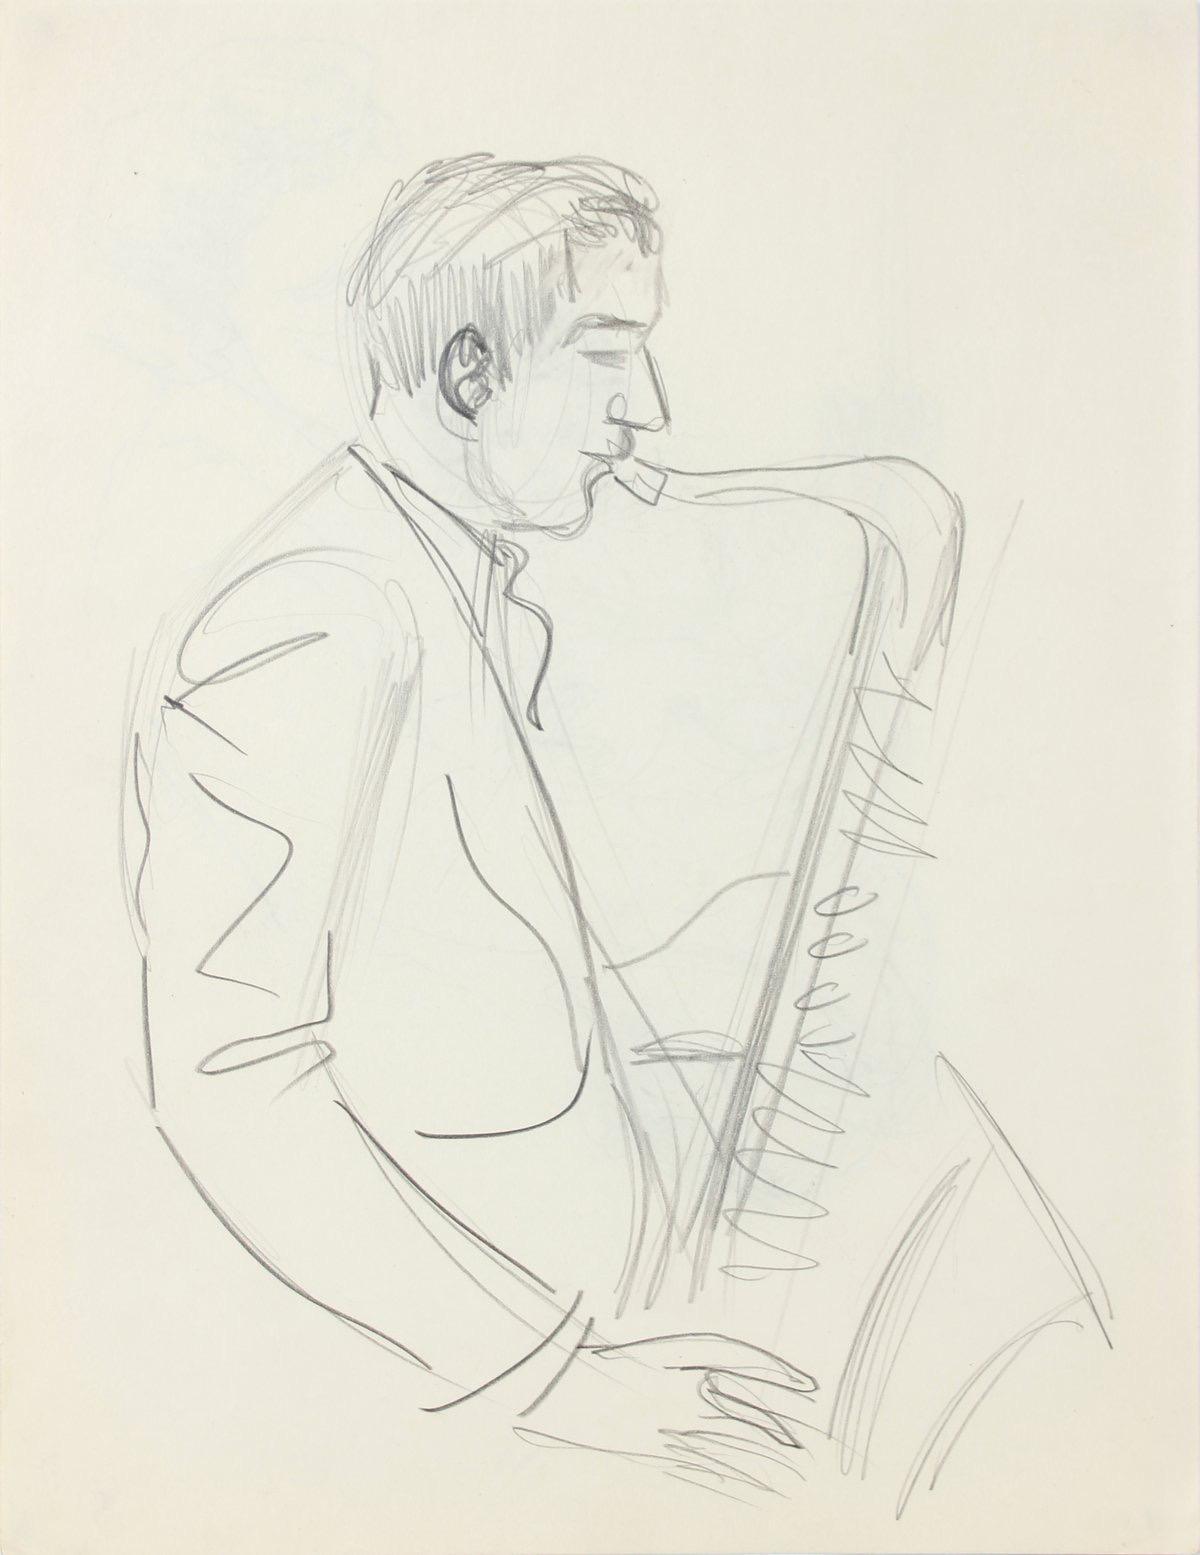 Saxophone Player, New York 1940-50s Graphite